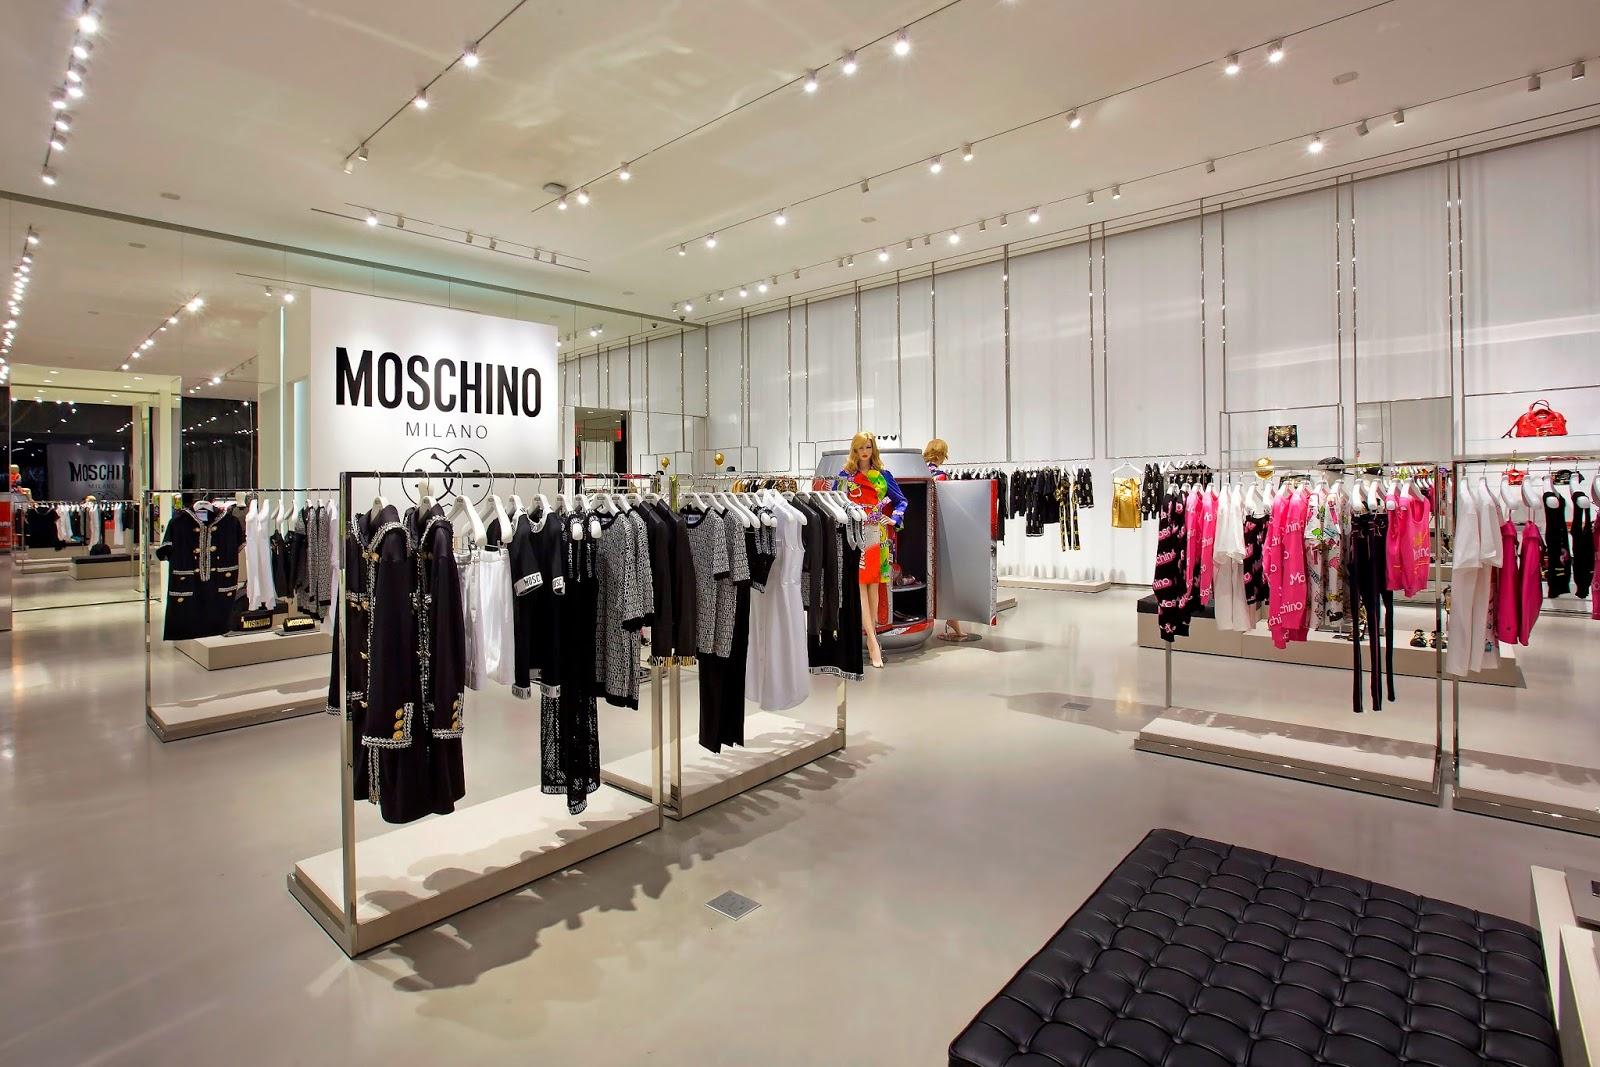 Moschino West Hollywood Clothing Racks